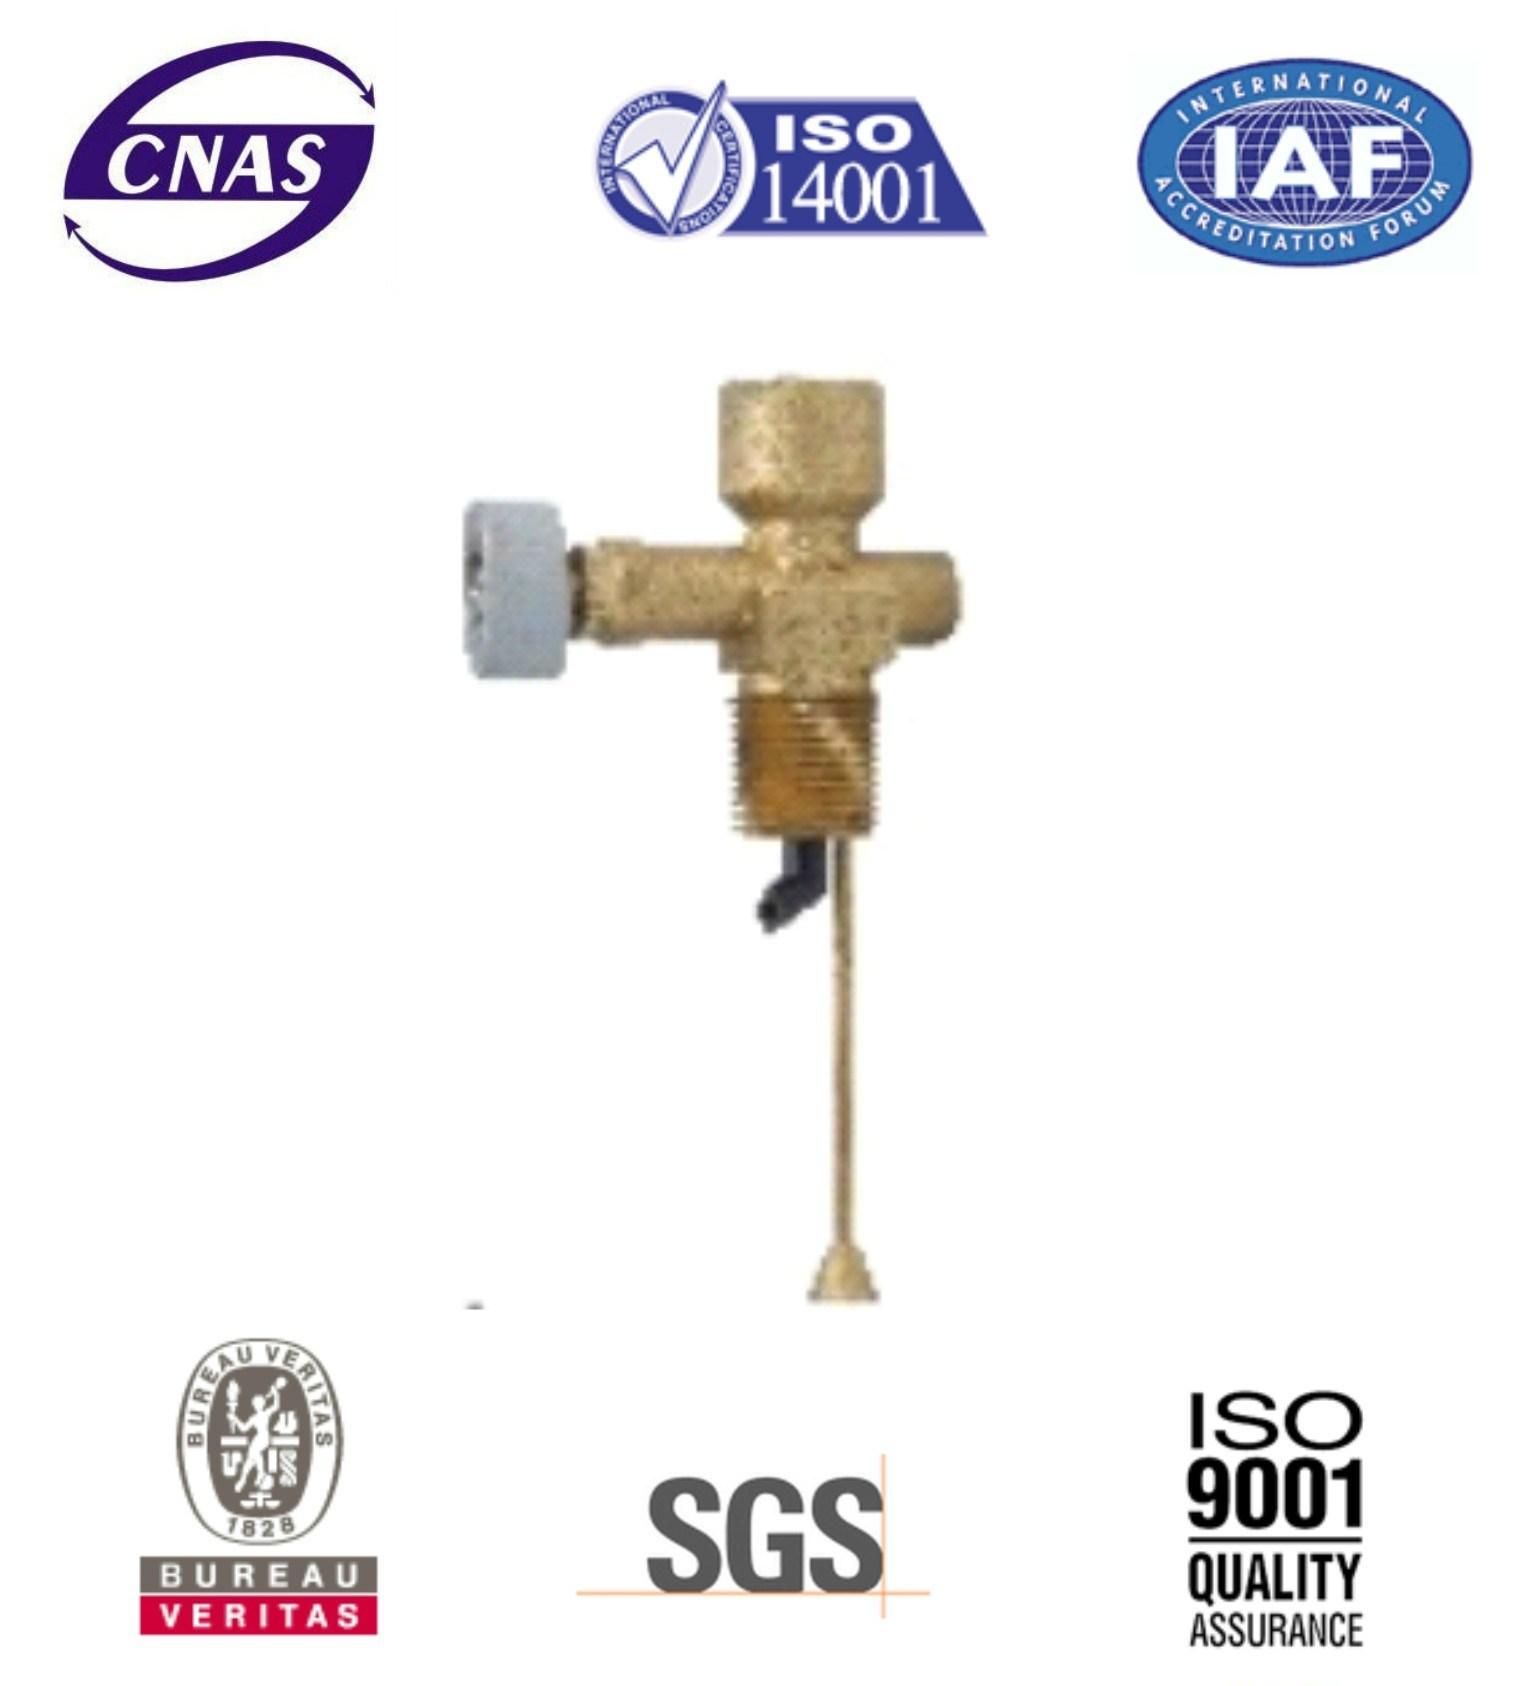 LPG Cylinder Valve - Gas Cylinder Valve (YSF-1D)